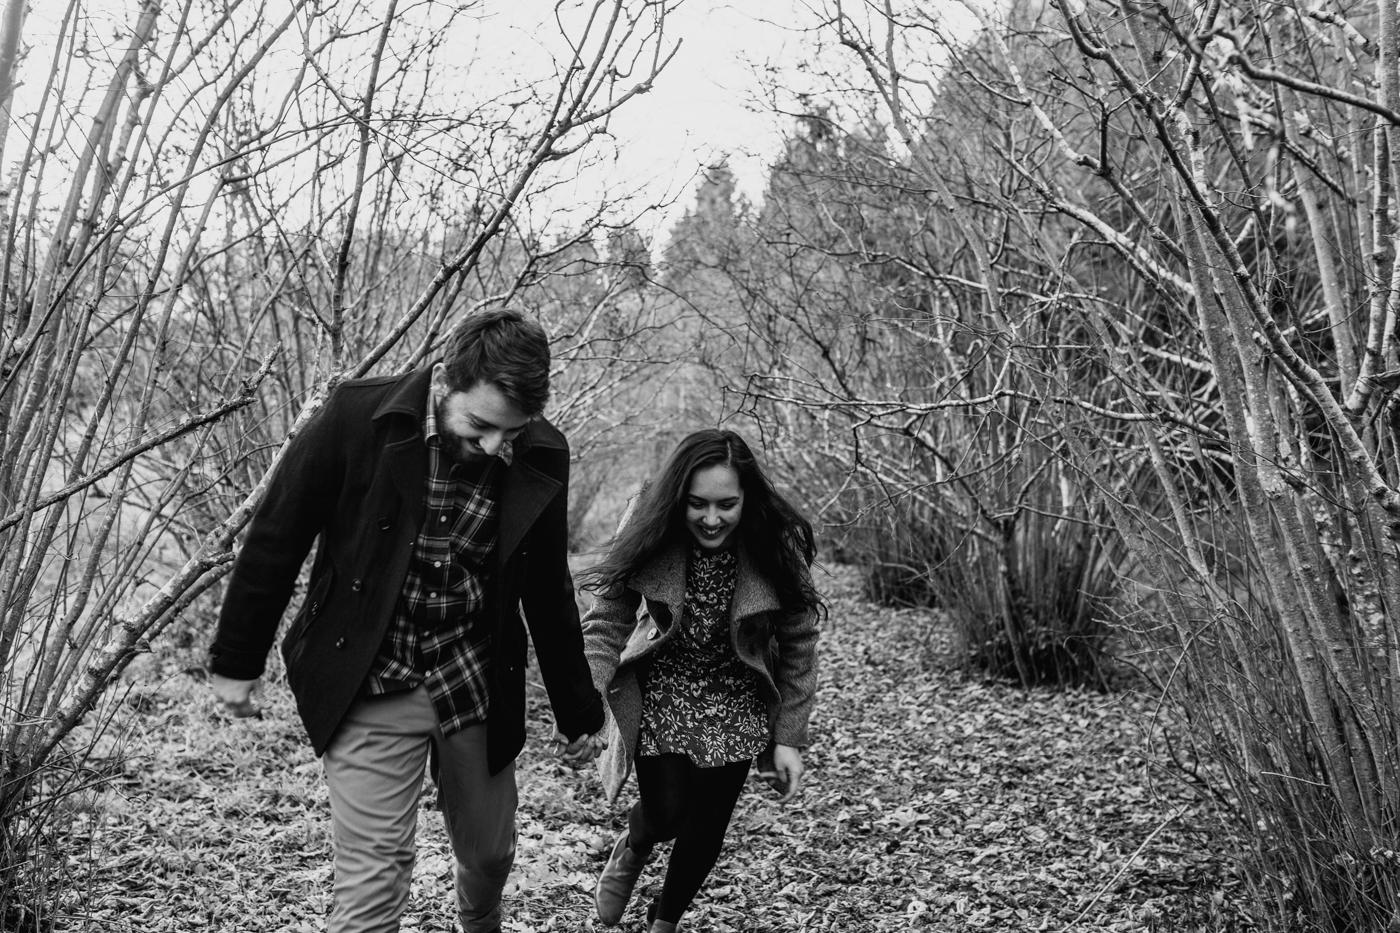 Kate & Kieran - Southern Highlands Engagement - Samantha Heather Photography-38.jpg